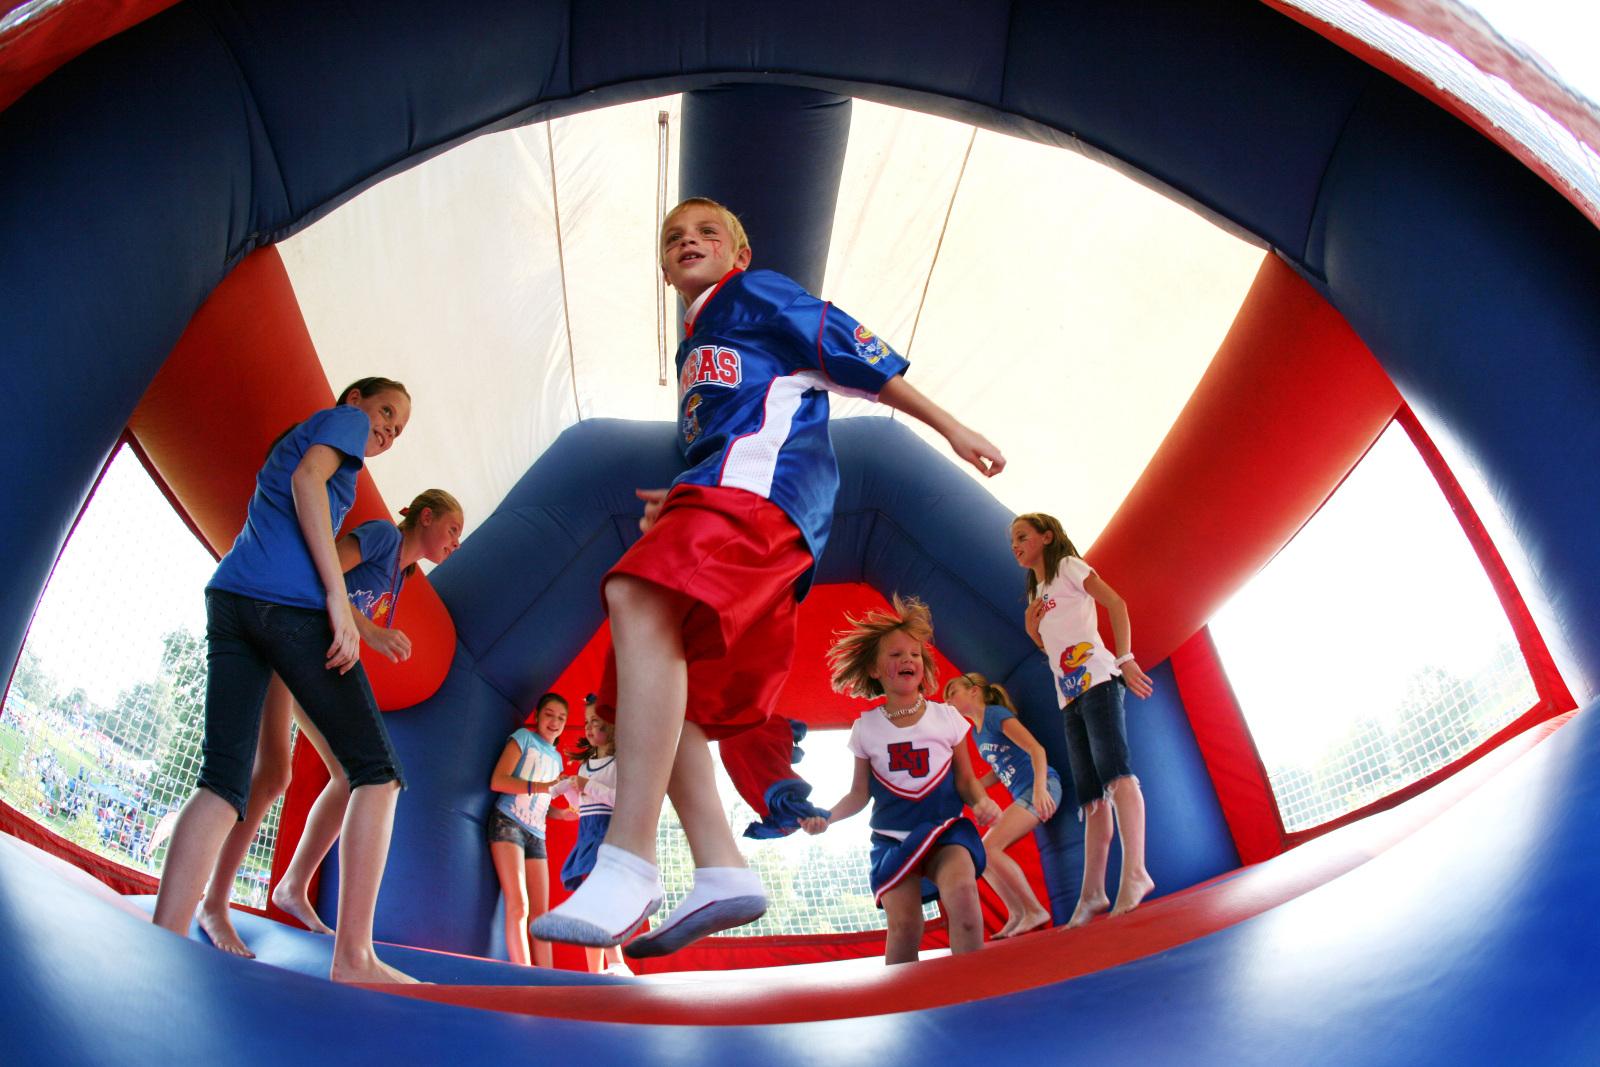 KU football HyVee Hawk Zone for kids